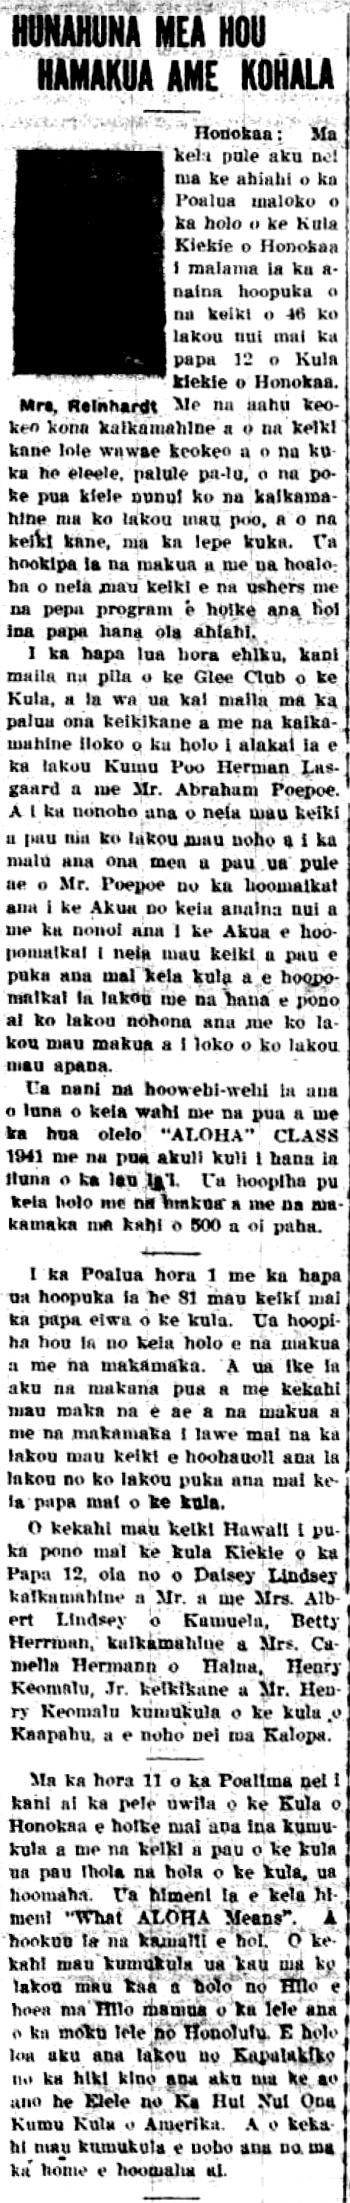 HokuoHawaii_6_11_1941_1.png